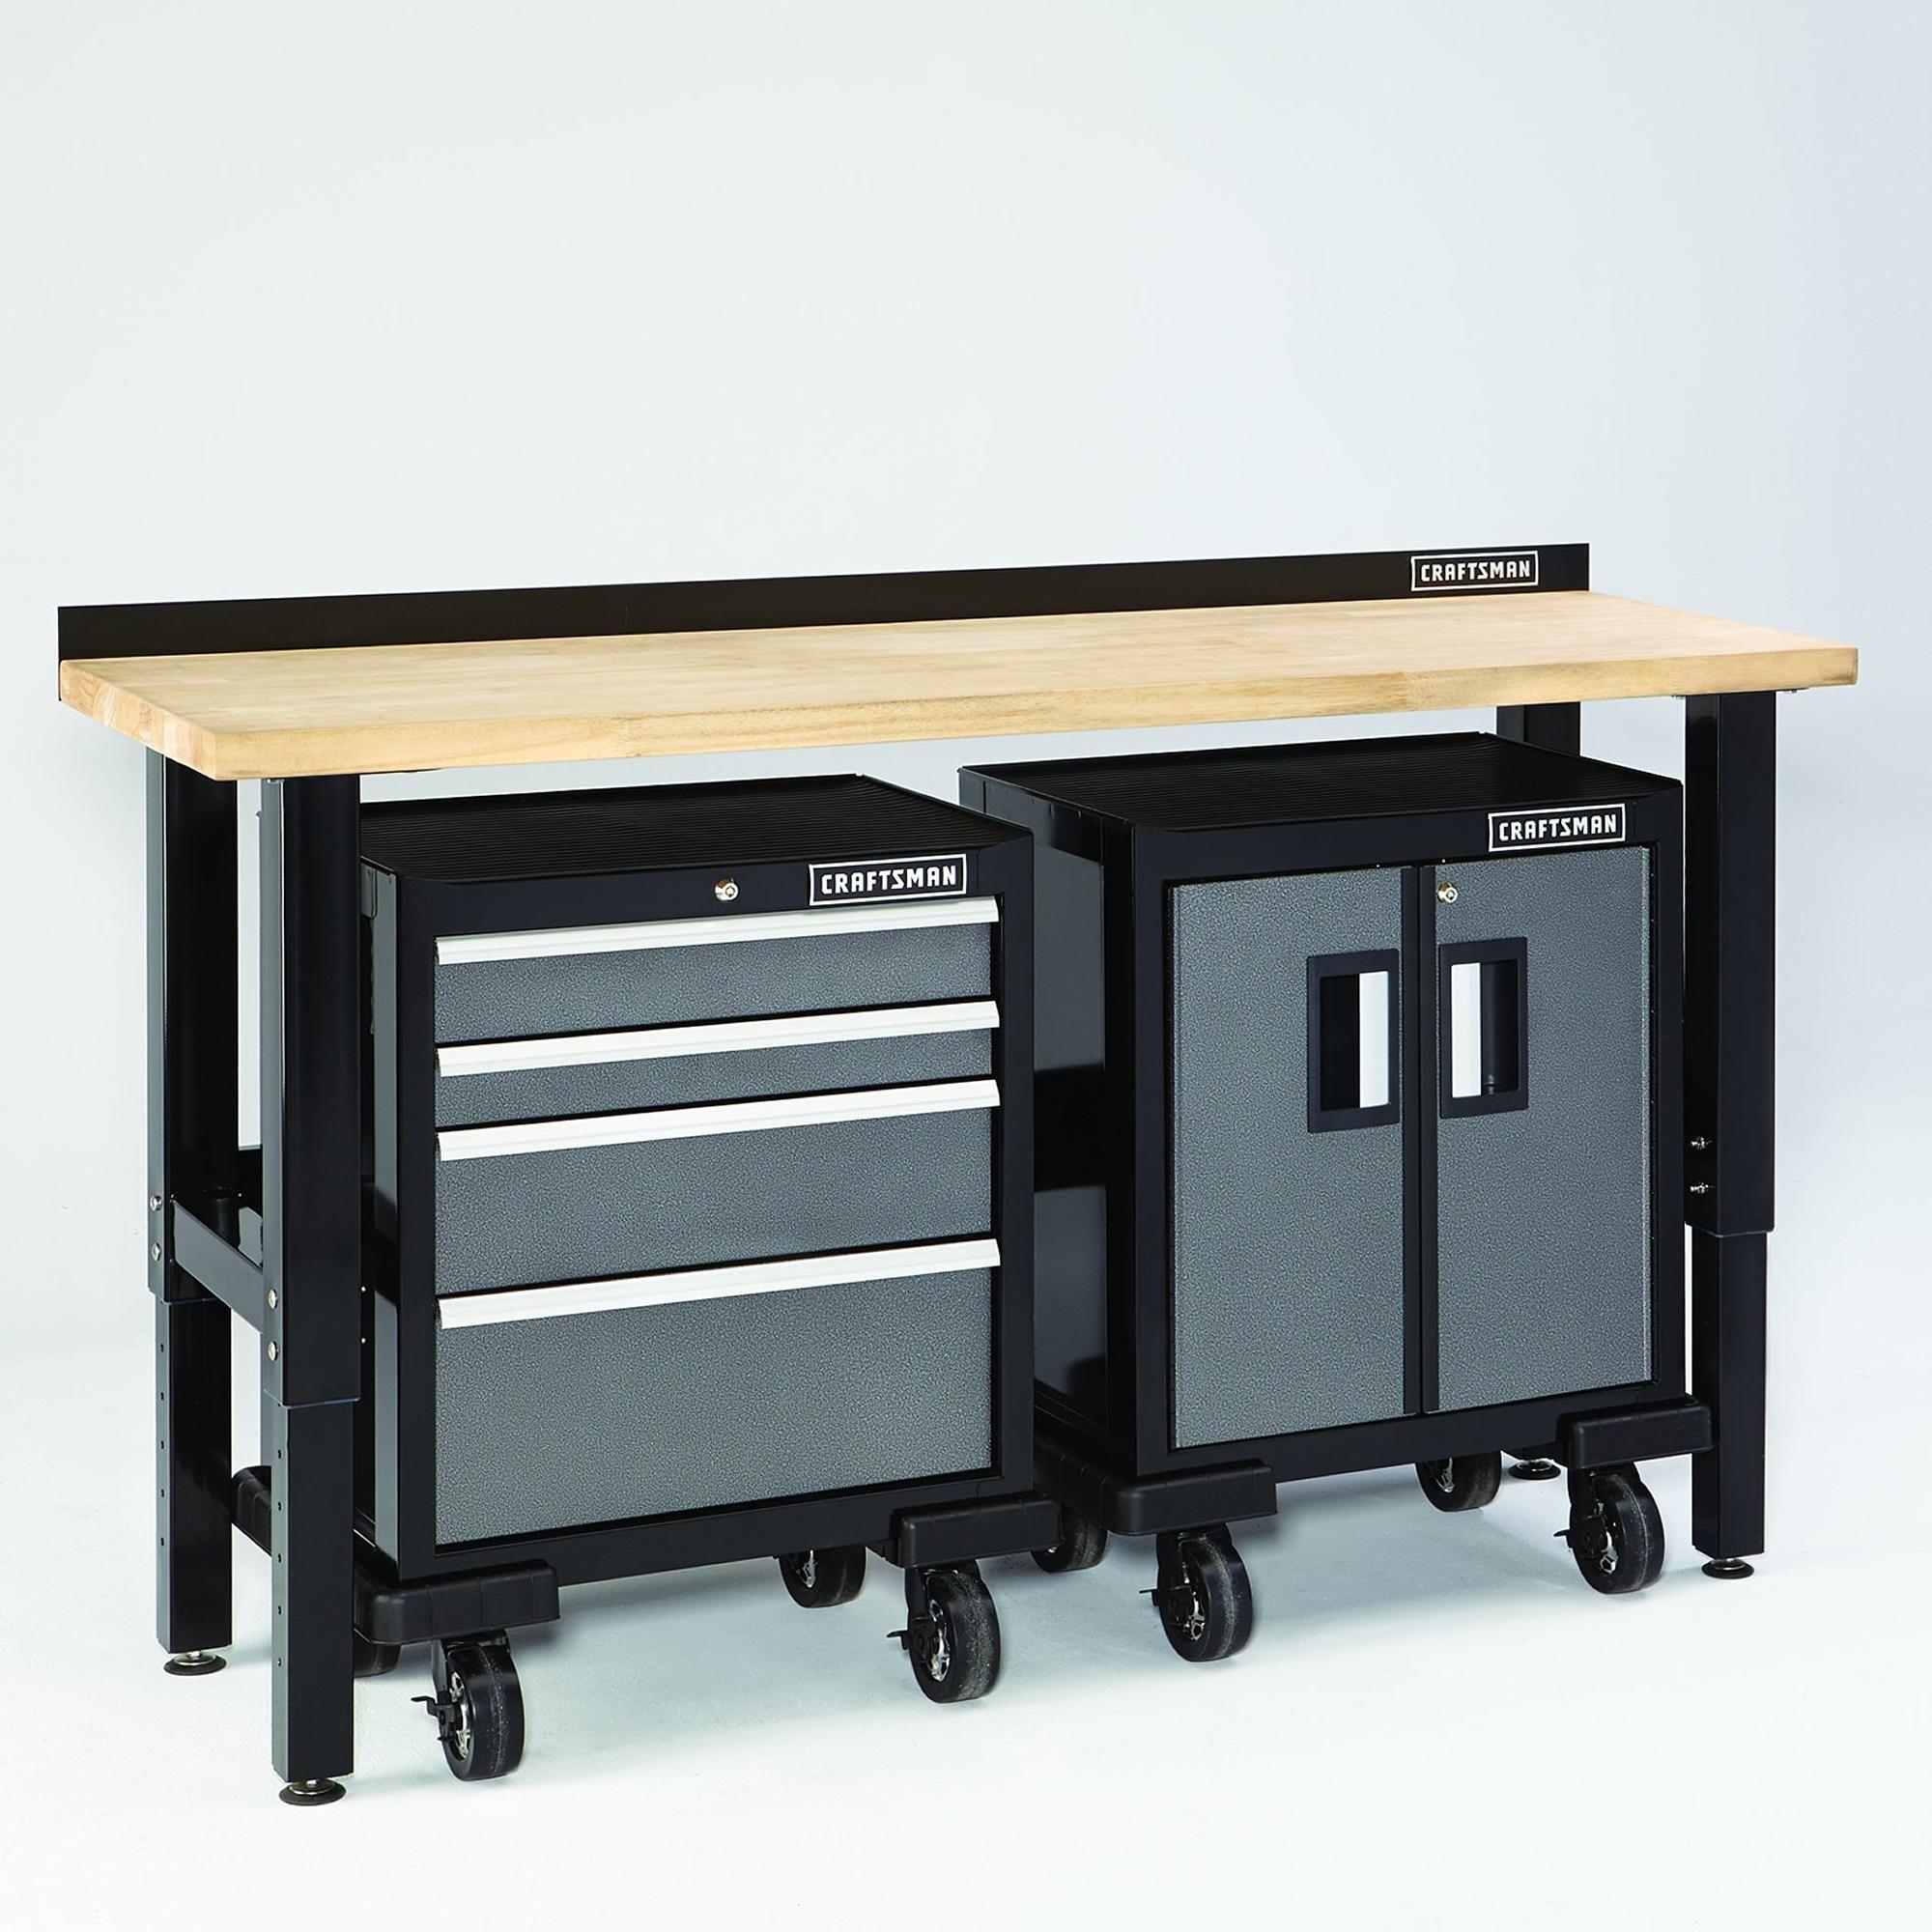 Craftsman 6 Premium Heavy Duty Workbench W Butcher Block Top Heavy Duty Work Bench Workbench Craftsman